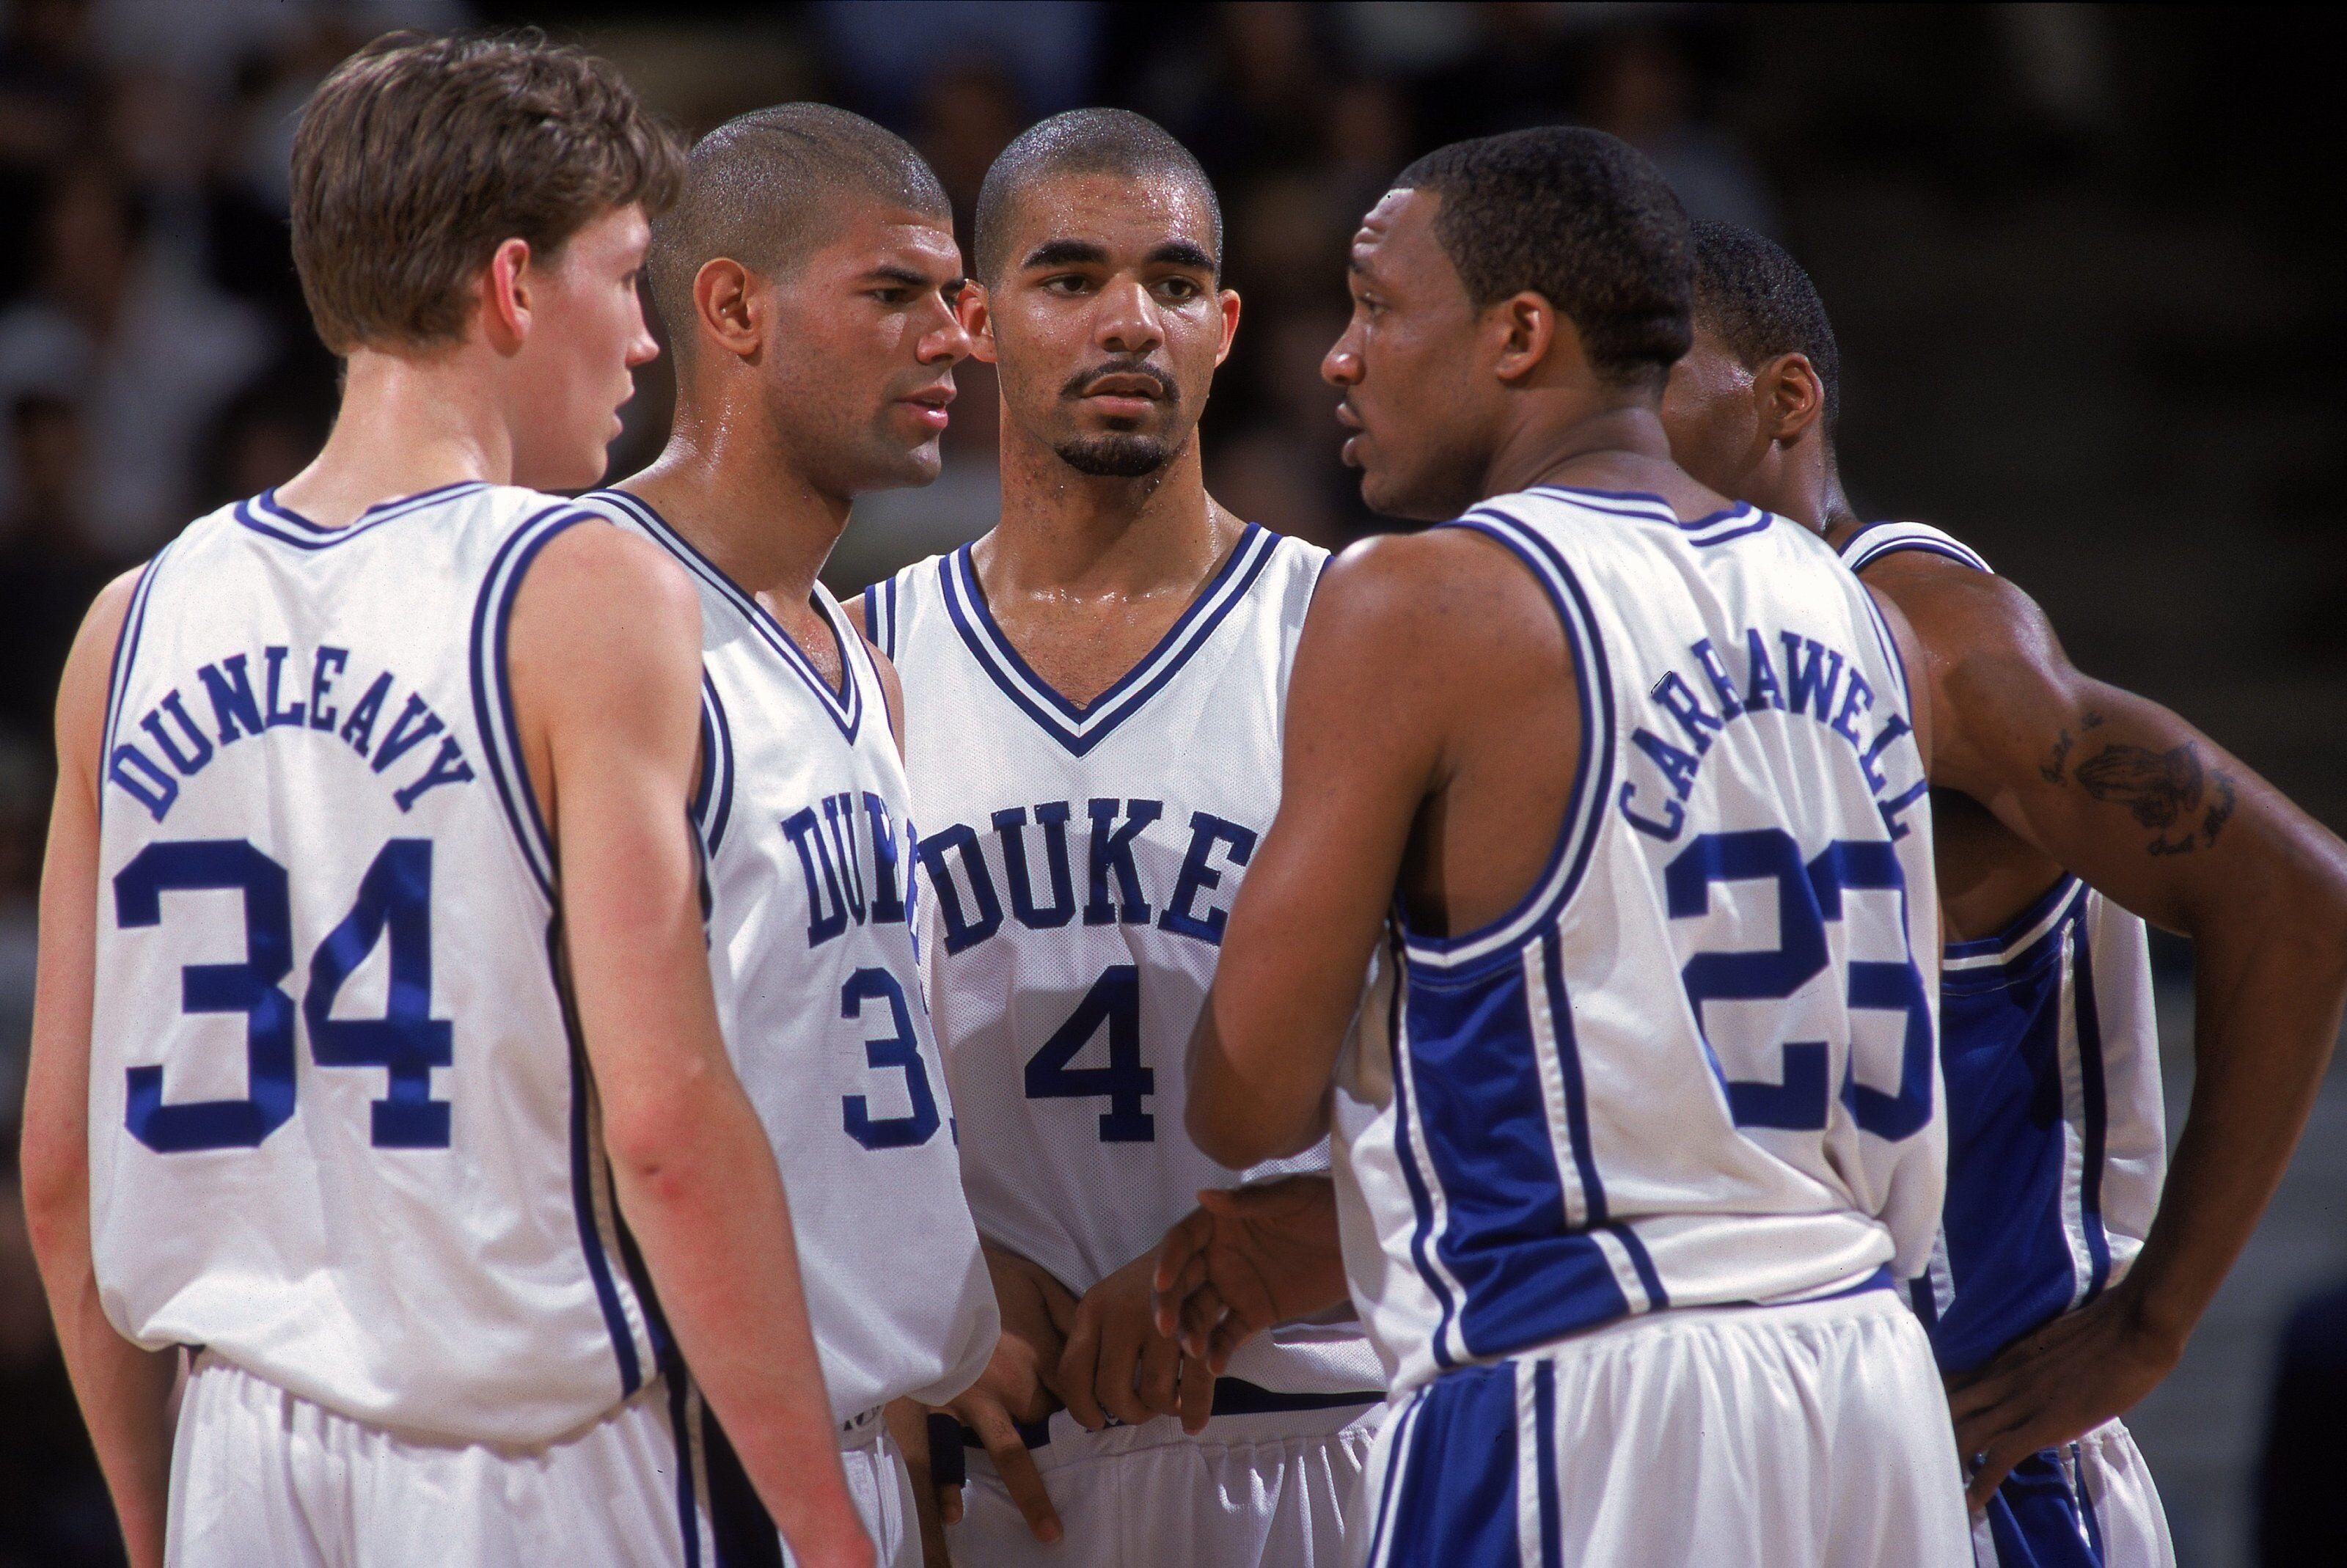 Son of Duke basketball alum has perfect name, dad-like game